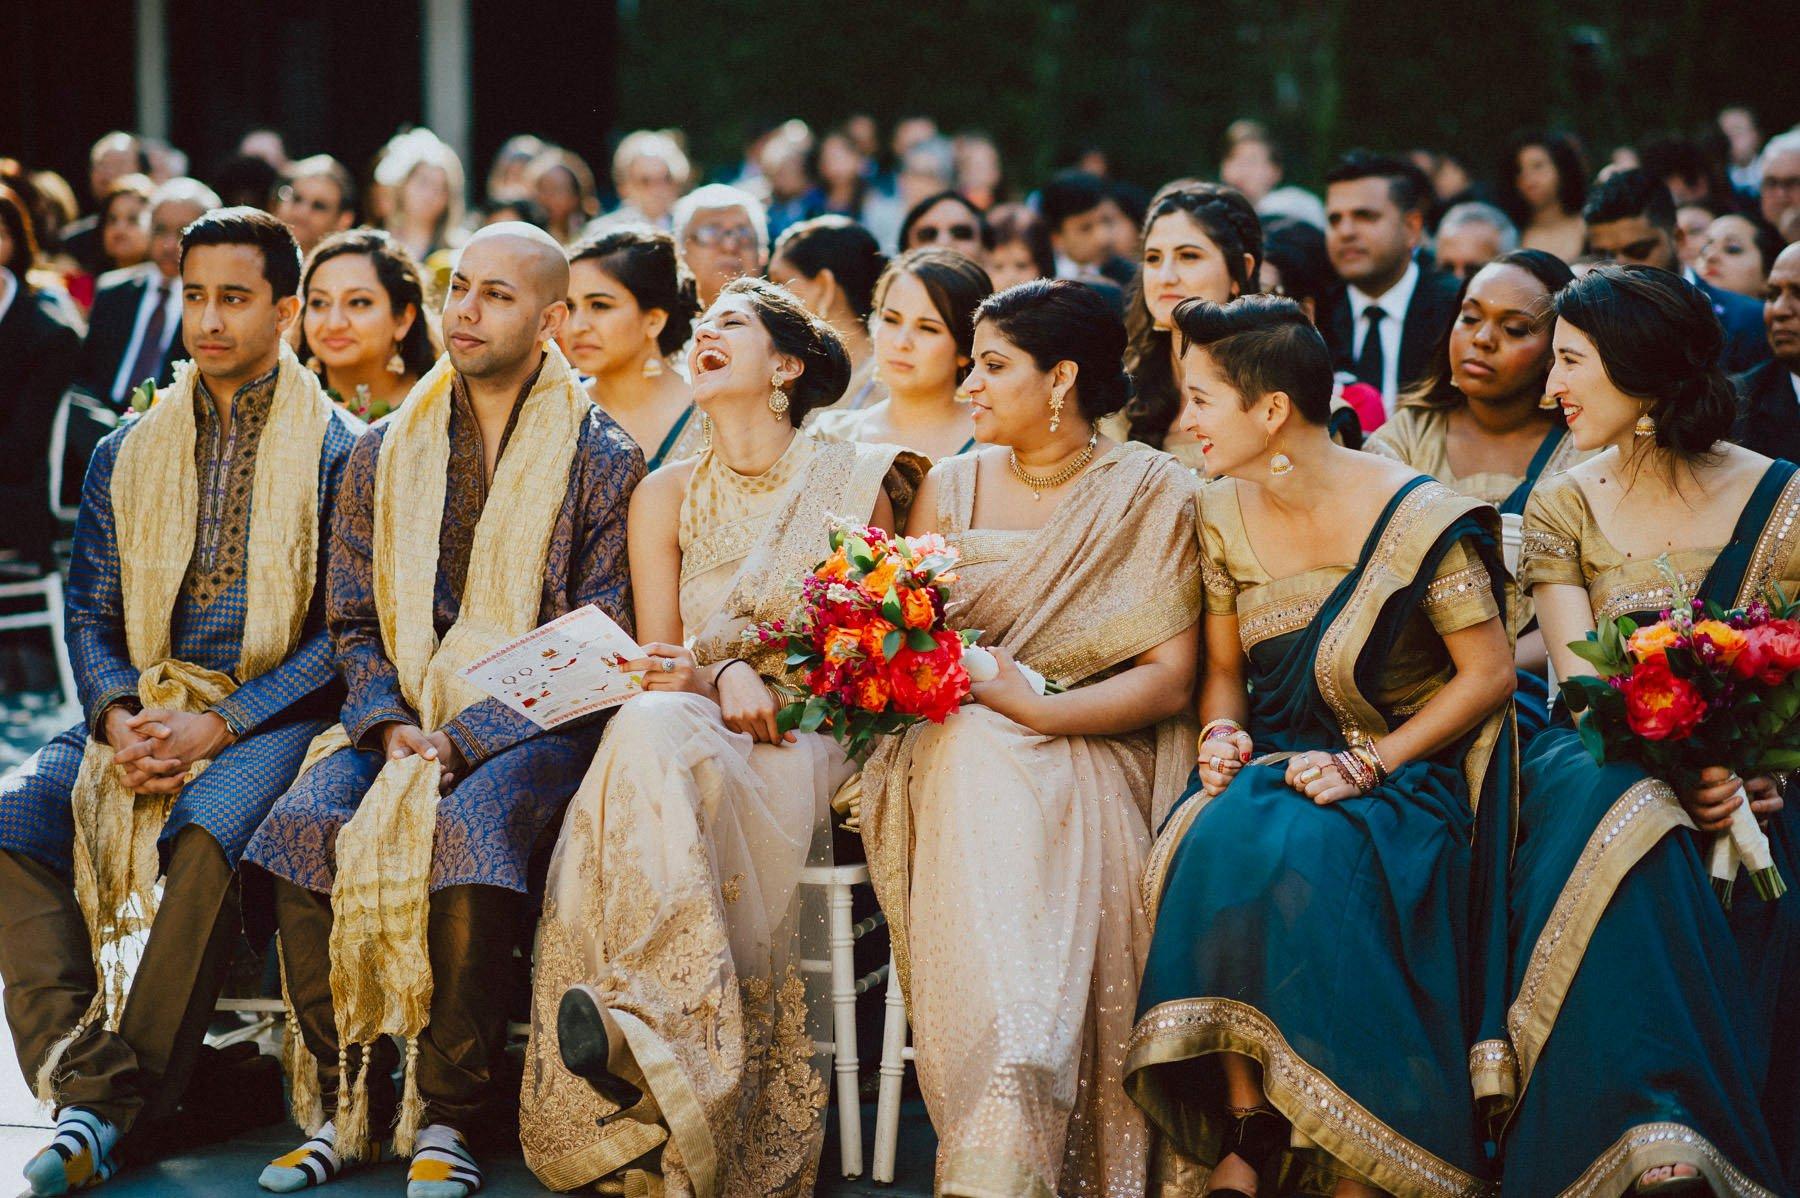 vie-philadelphia-indian-wedding-81.jpg